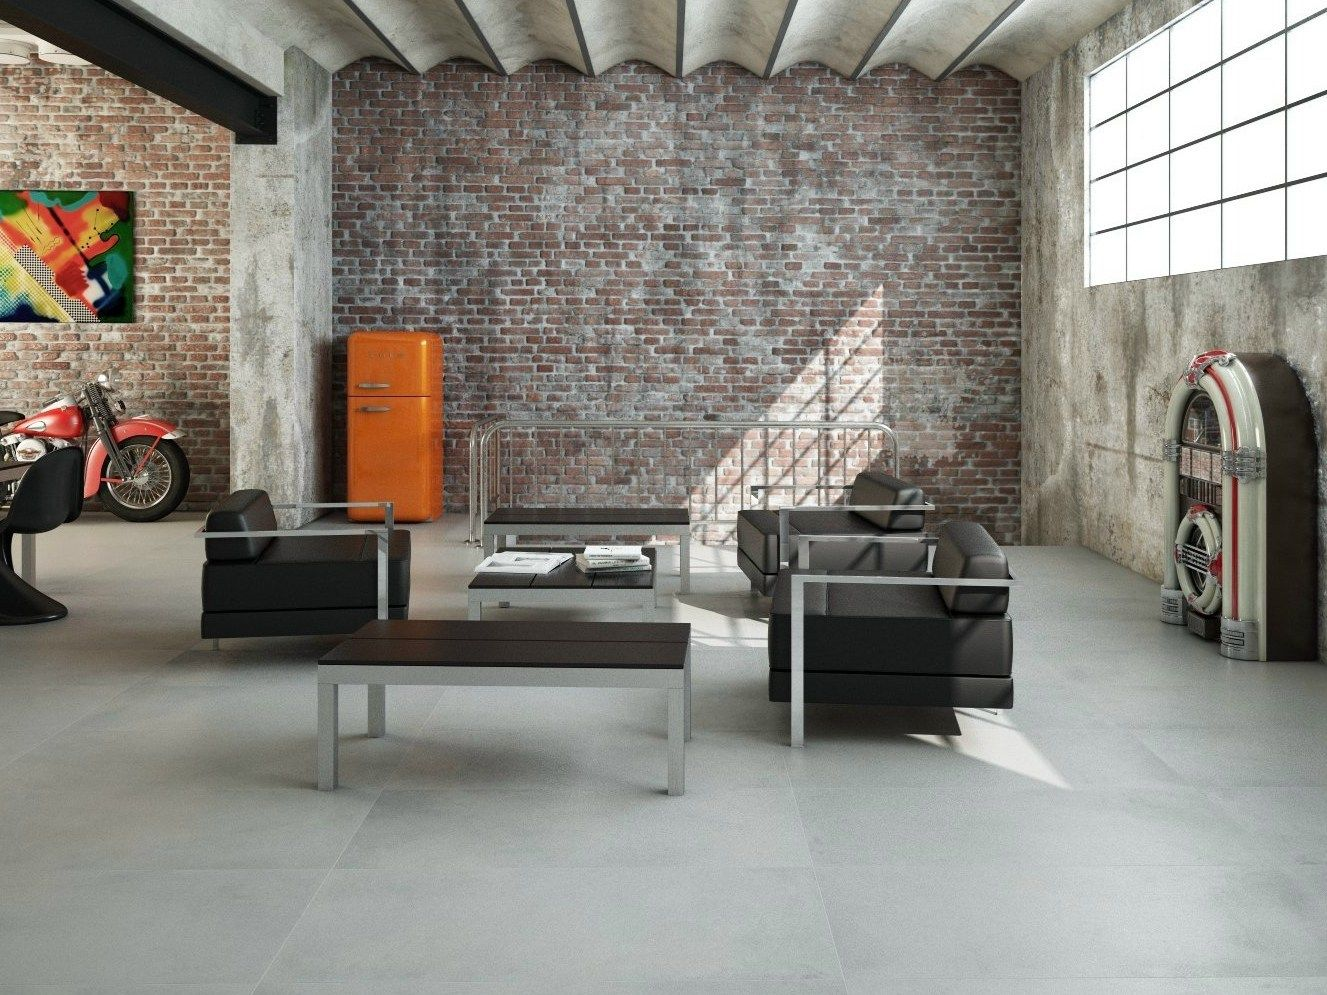 Cisa ceramiche cement effect tiles u bathhouse